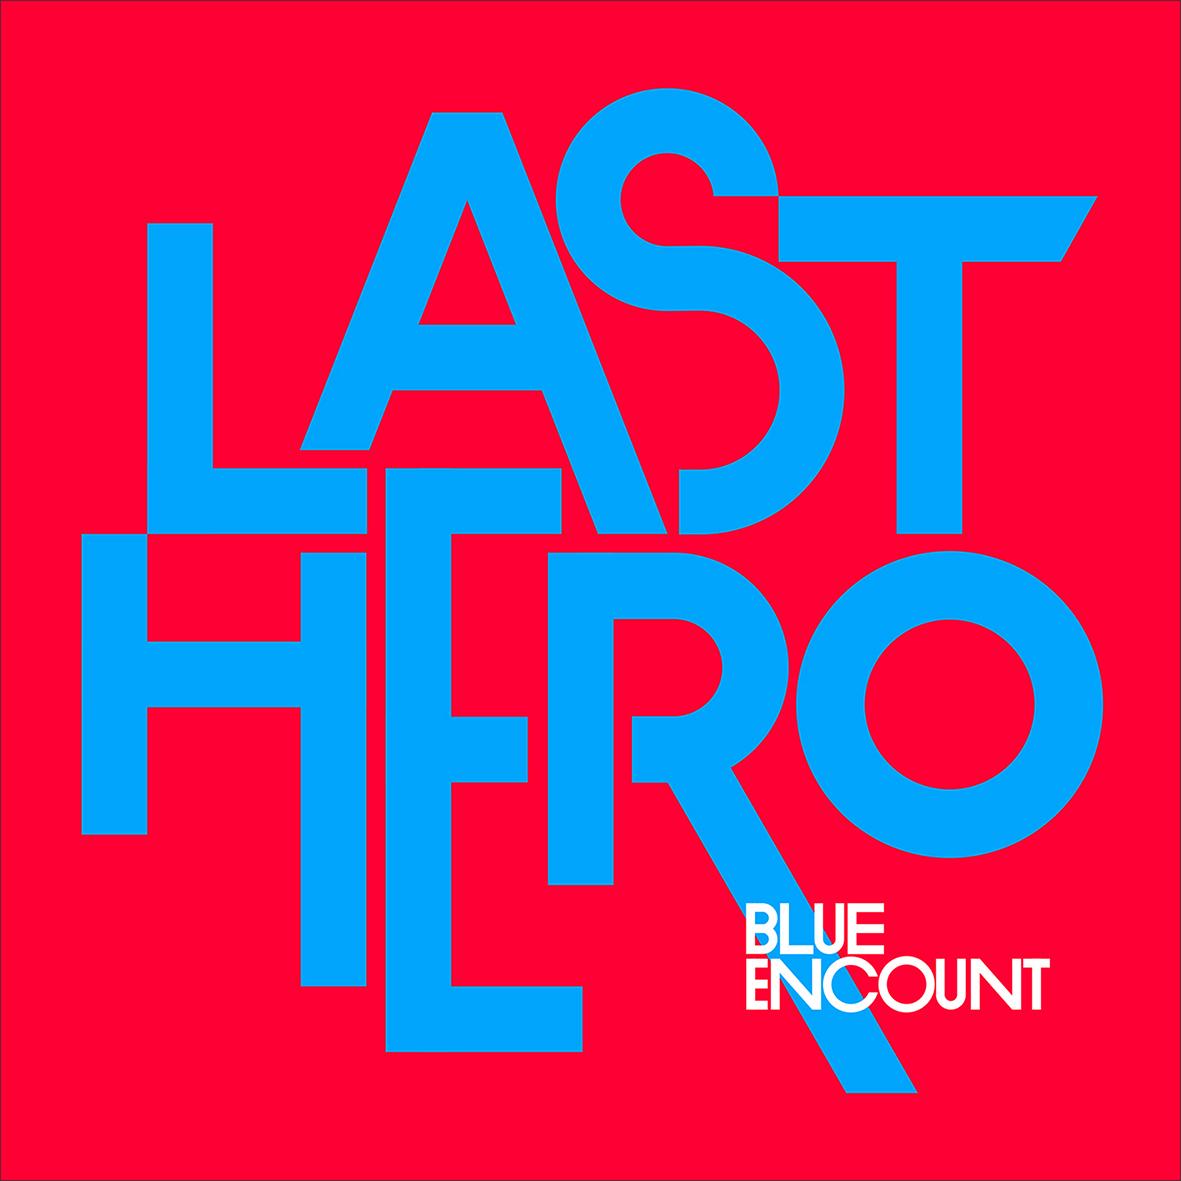 BLUE ENCOUNT/「LAST HERO - 初回盤」